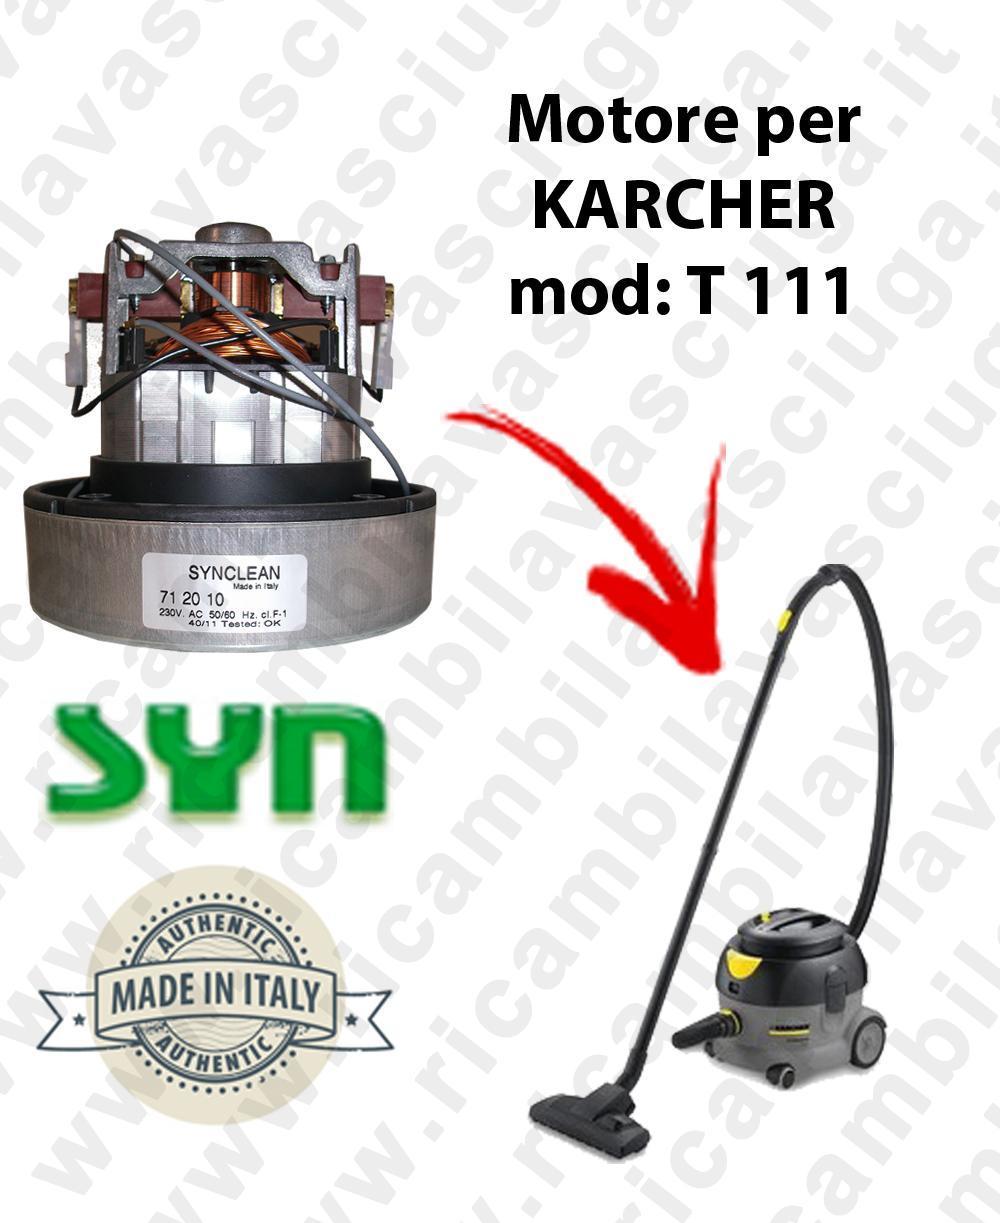 t 111 moteur aspiration synclean pour aspirateur karcher inclema fr. Black Bedroom Furniture Sets. Home Design Ideas